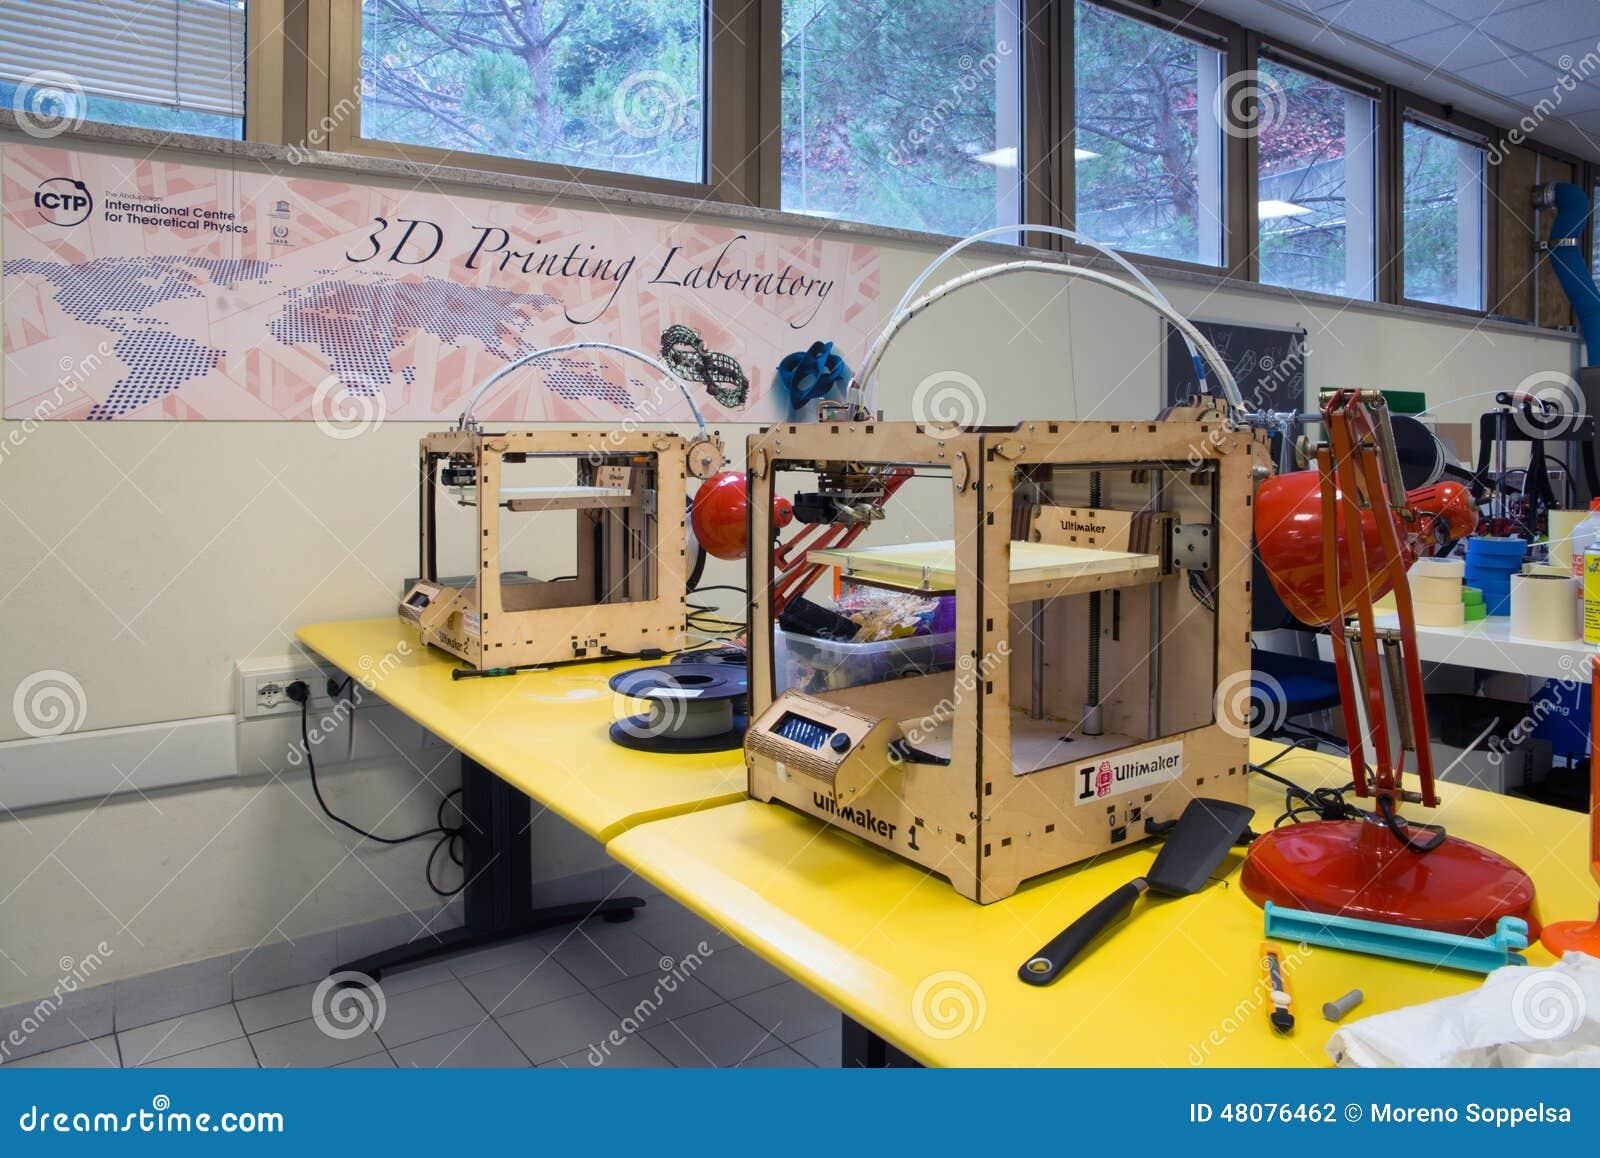 3d printing the italian scientific fablab editorial photography image 48076462 - 3d printer italia ...